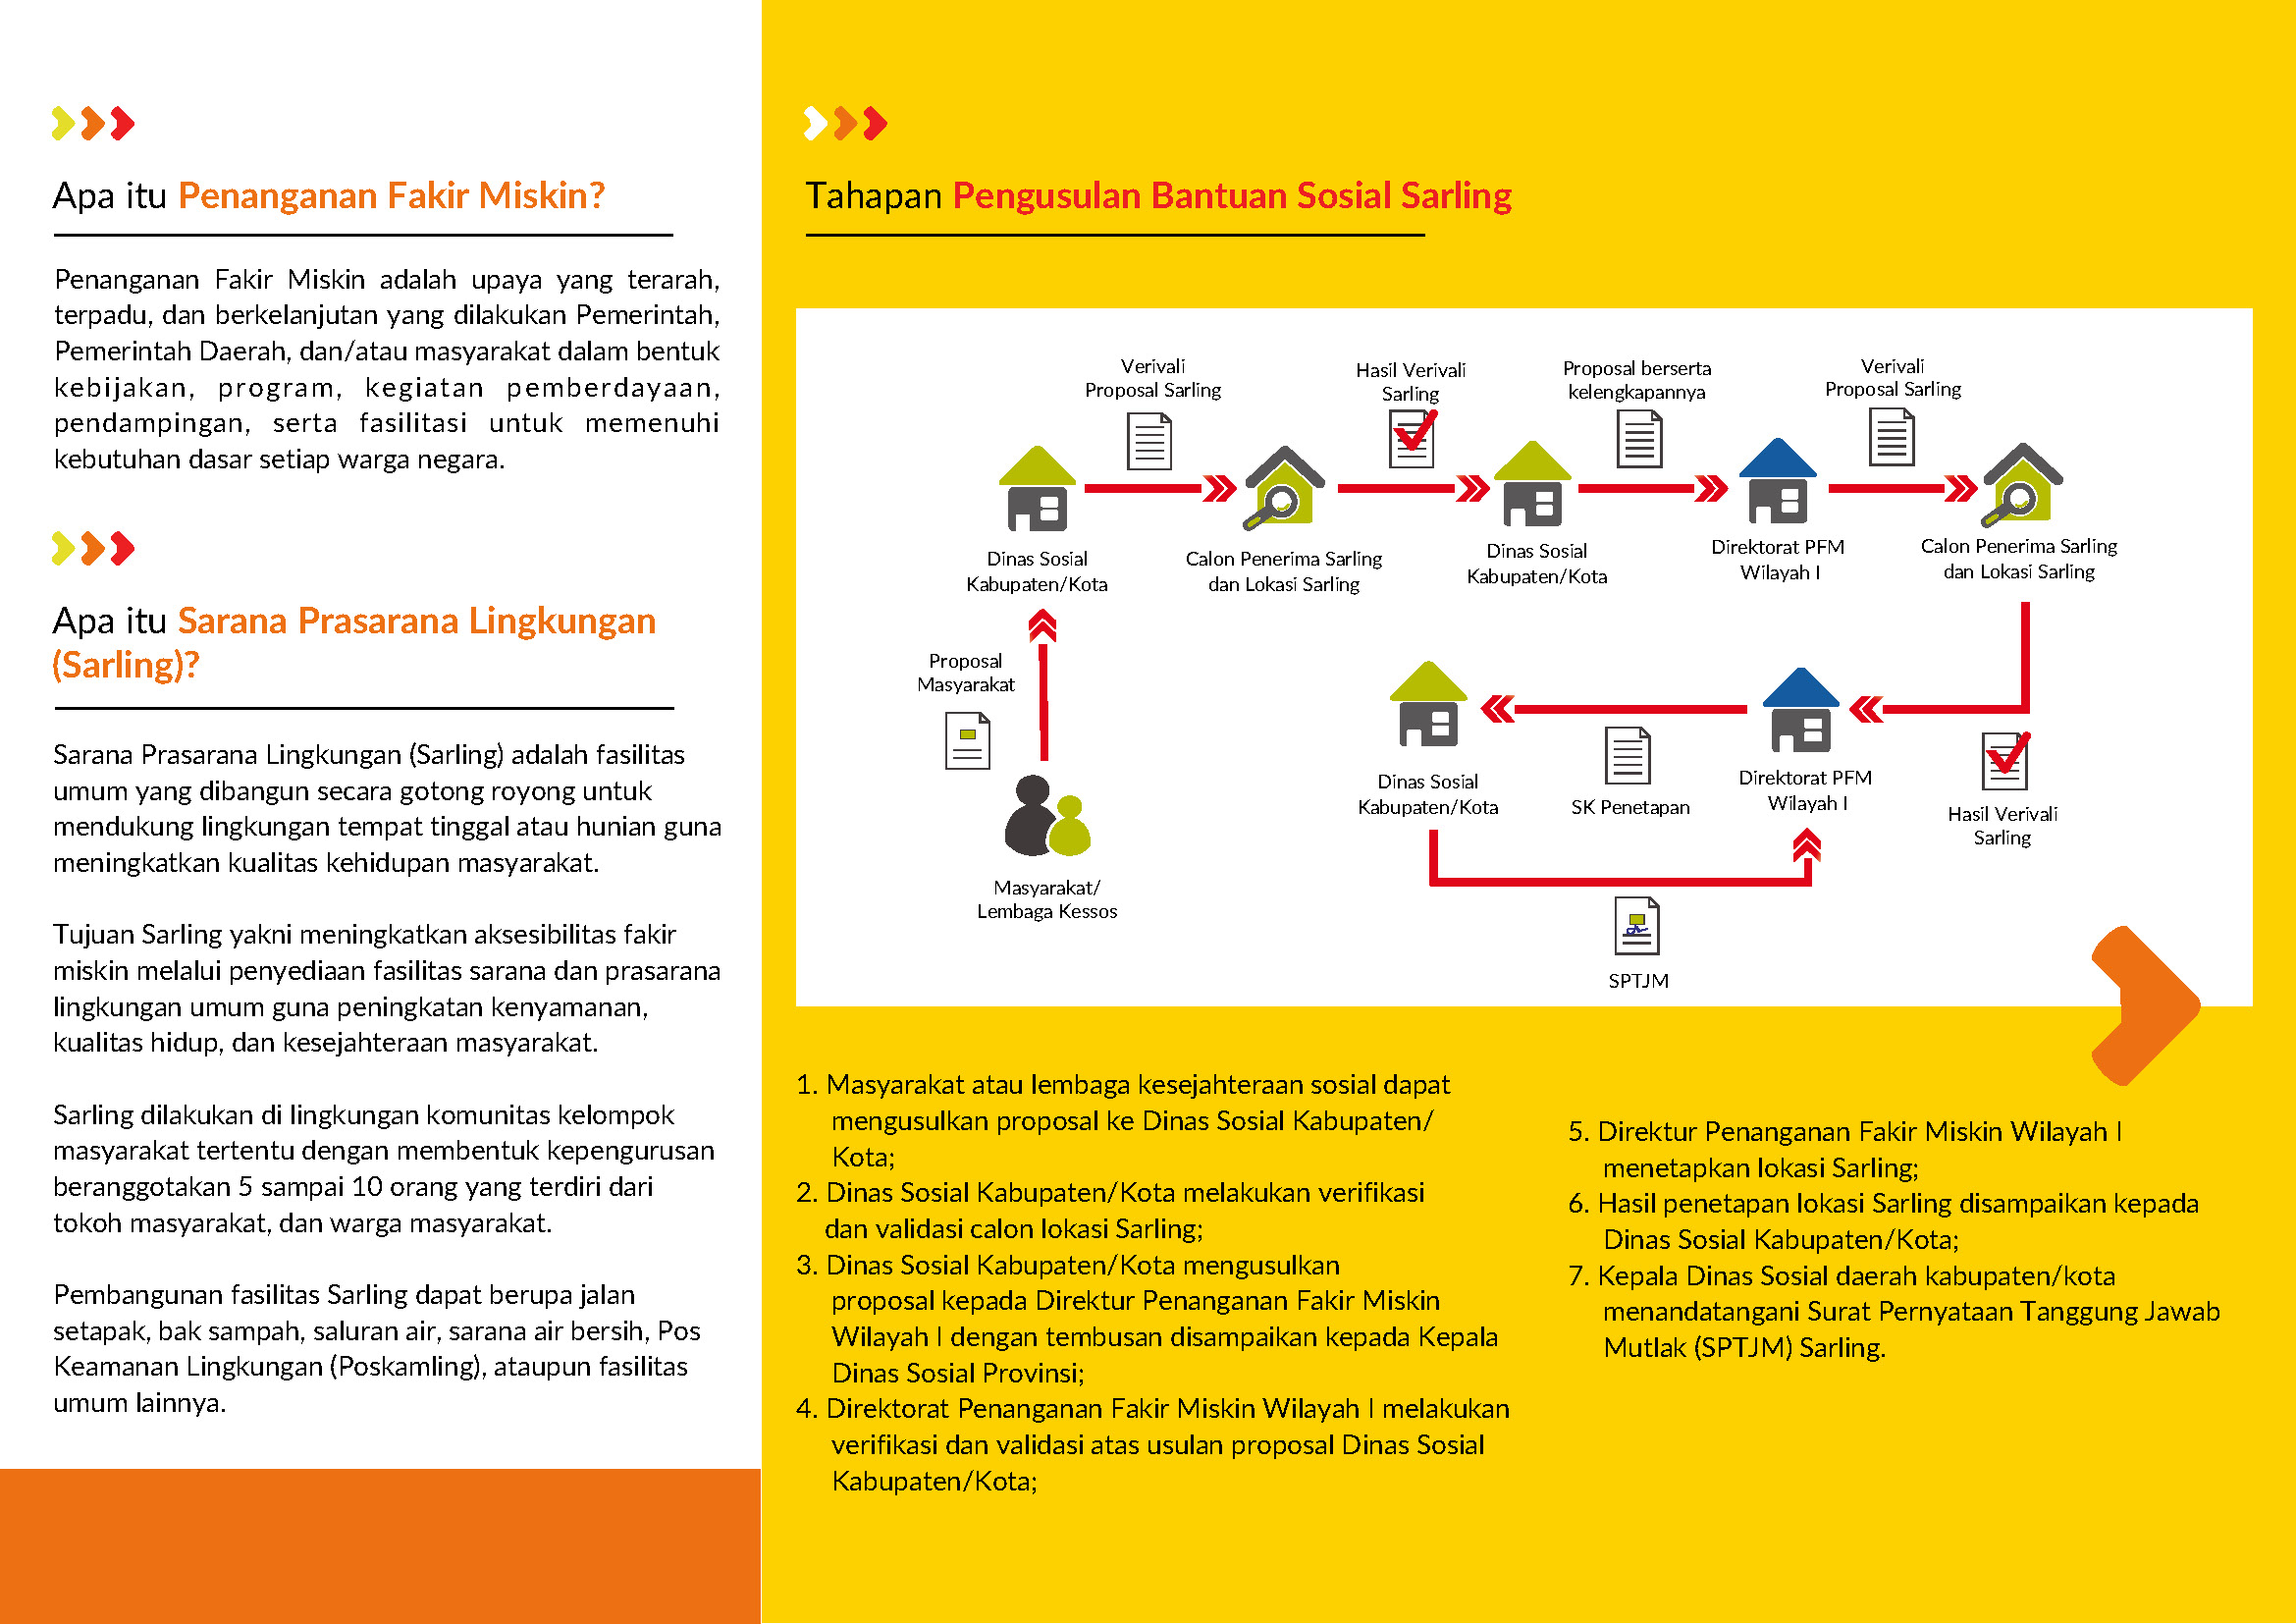 2019.03.13_Desain Leaflet PFM-Sarling REVISI X5 Kuning Revisi_Page_2